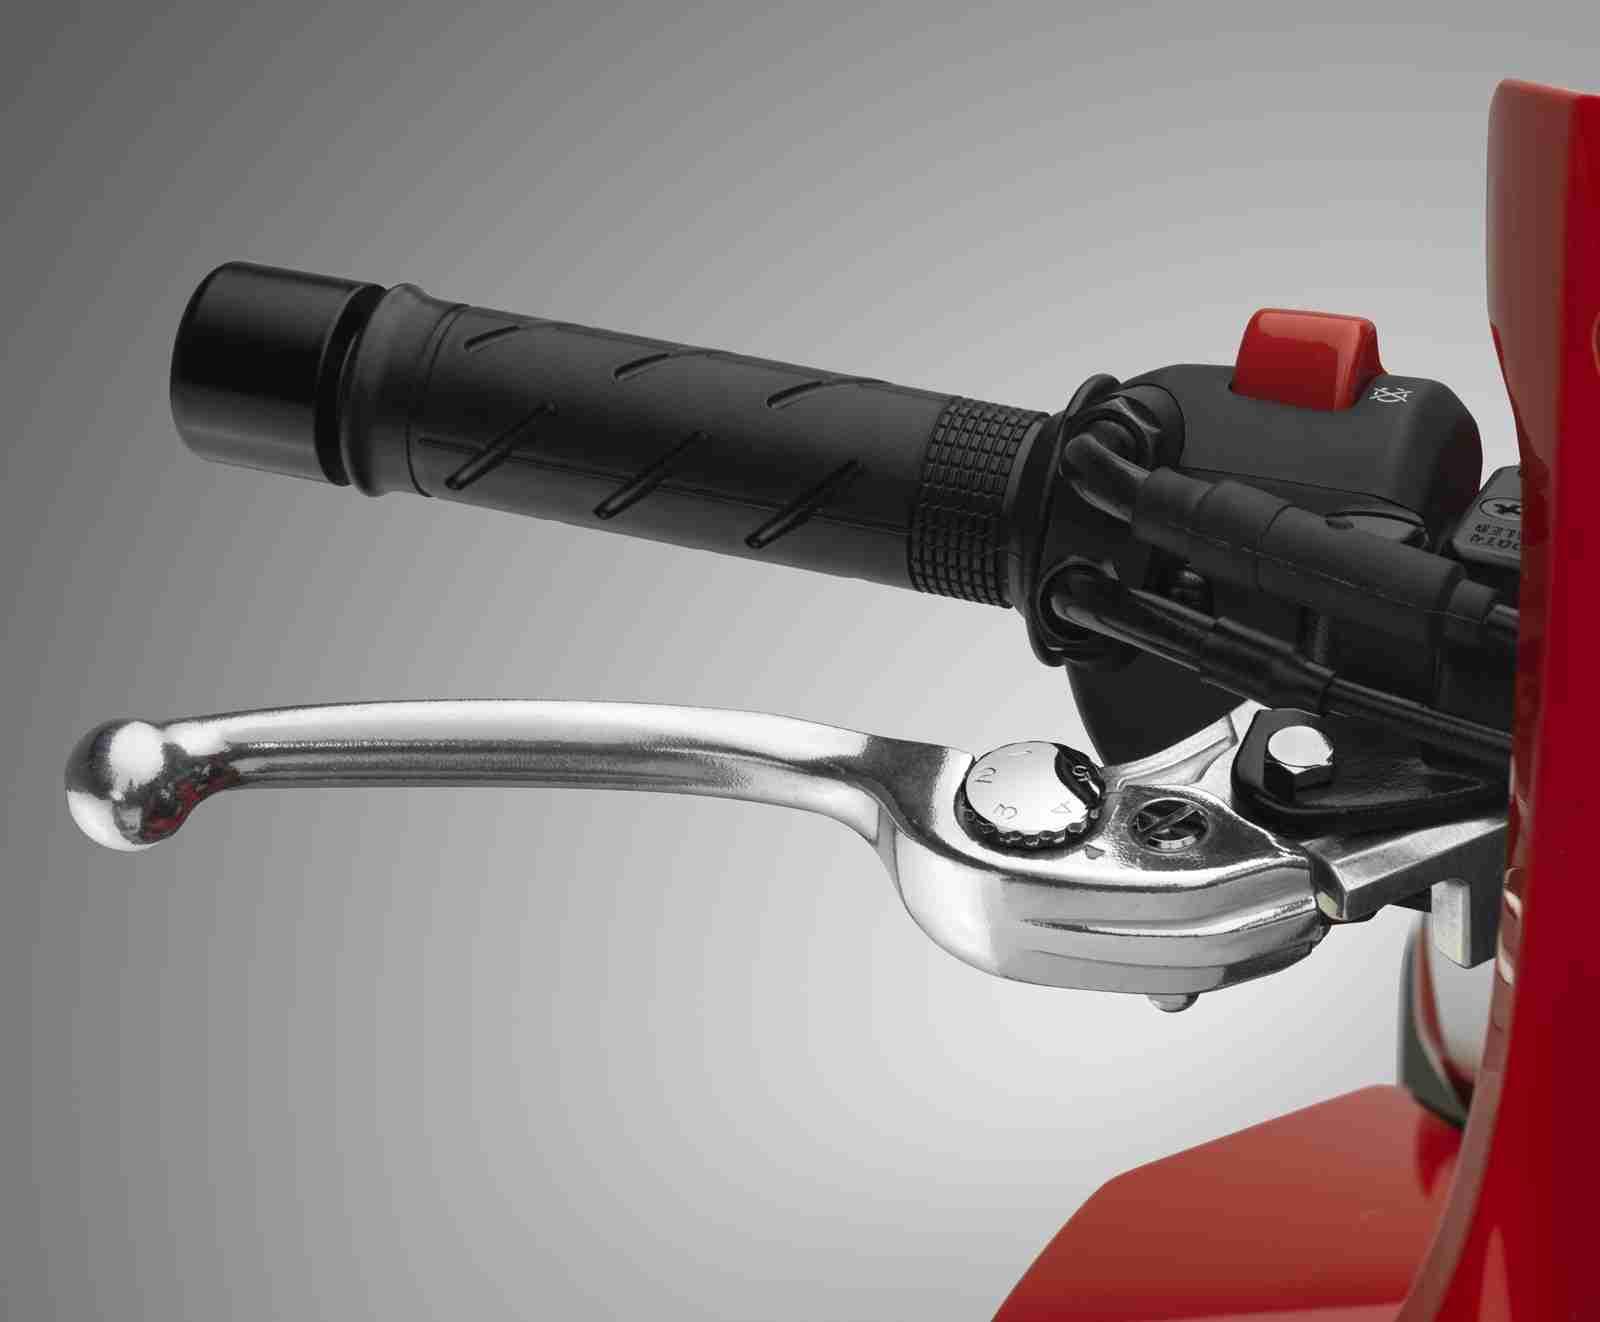 2016 Honda CBR500R adjustable lever